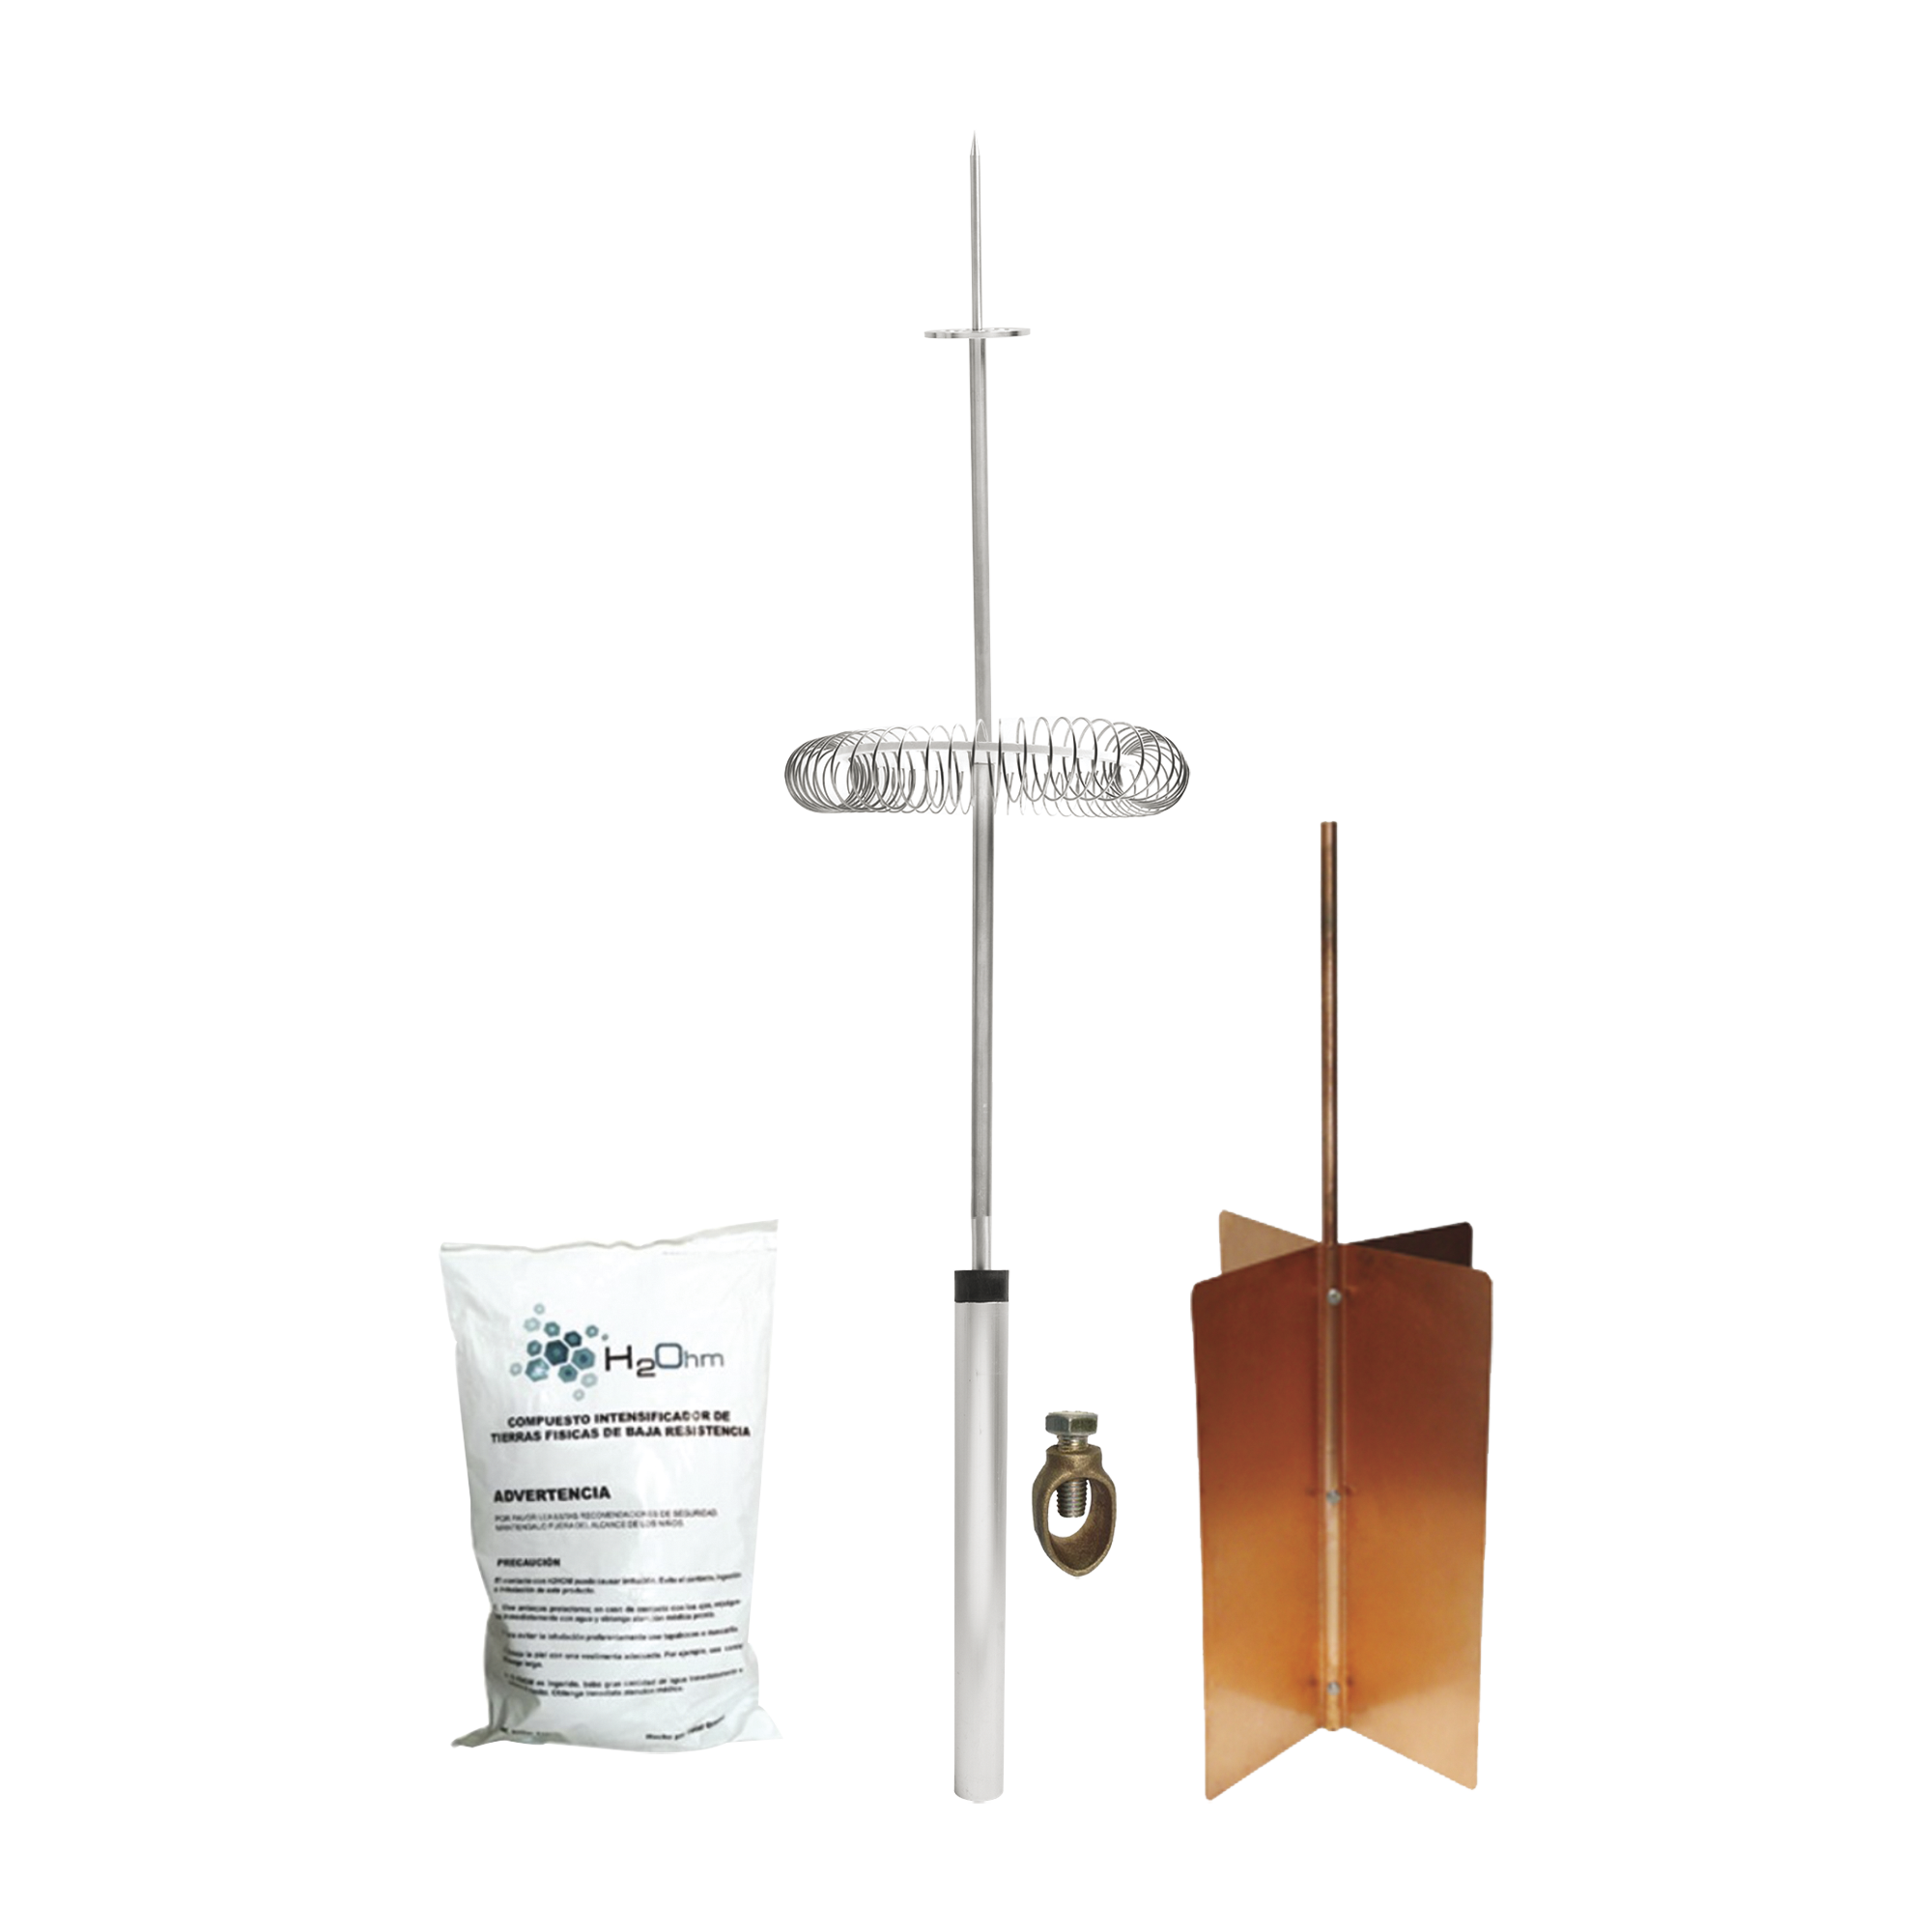 Kit Básico de Pararrayo con Punta Dipolo y Electrodo Tipo Rehilete. Instalación en Poste o Torre.